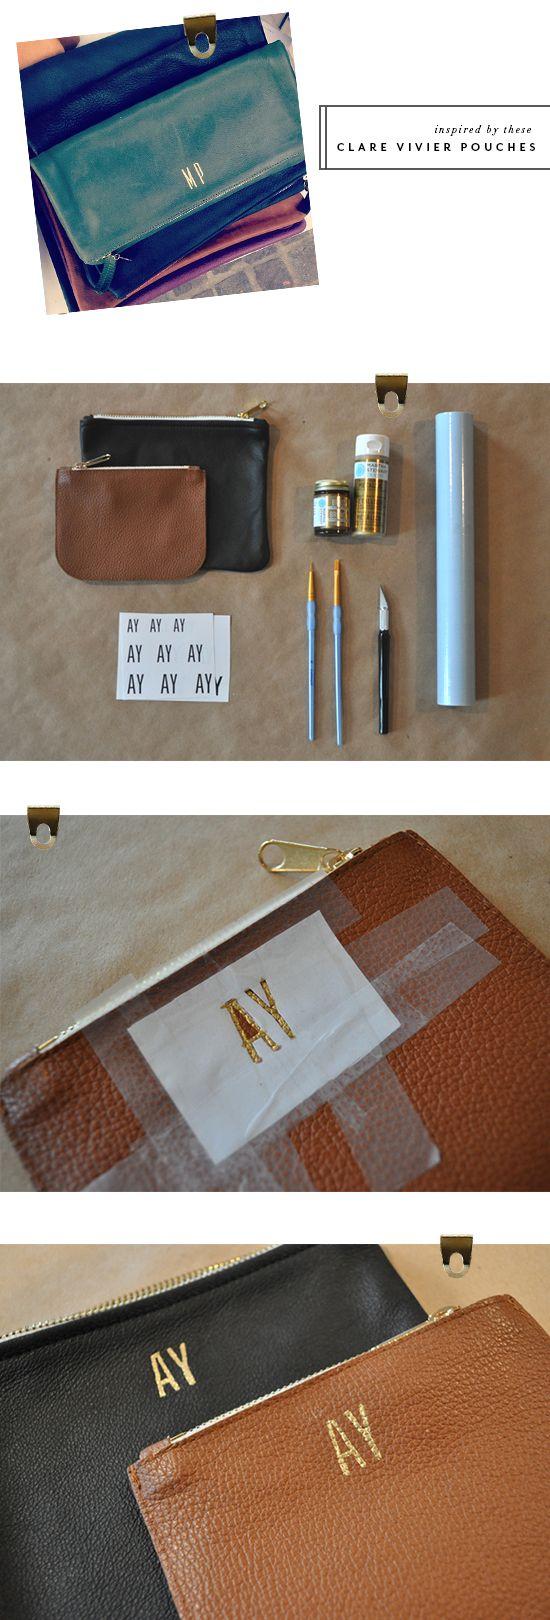 DIY pouch inspiration